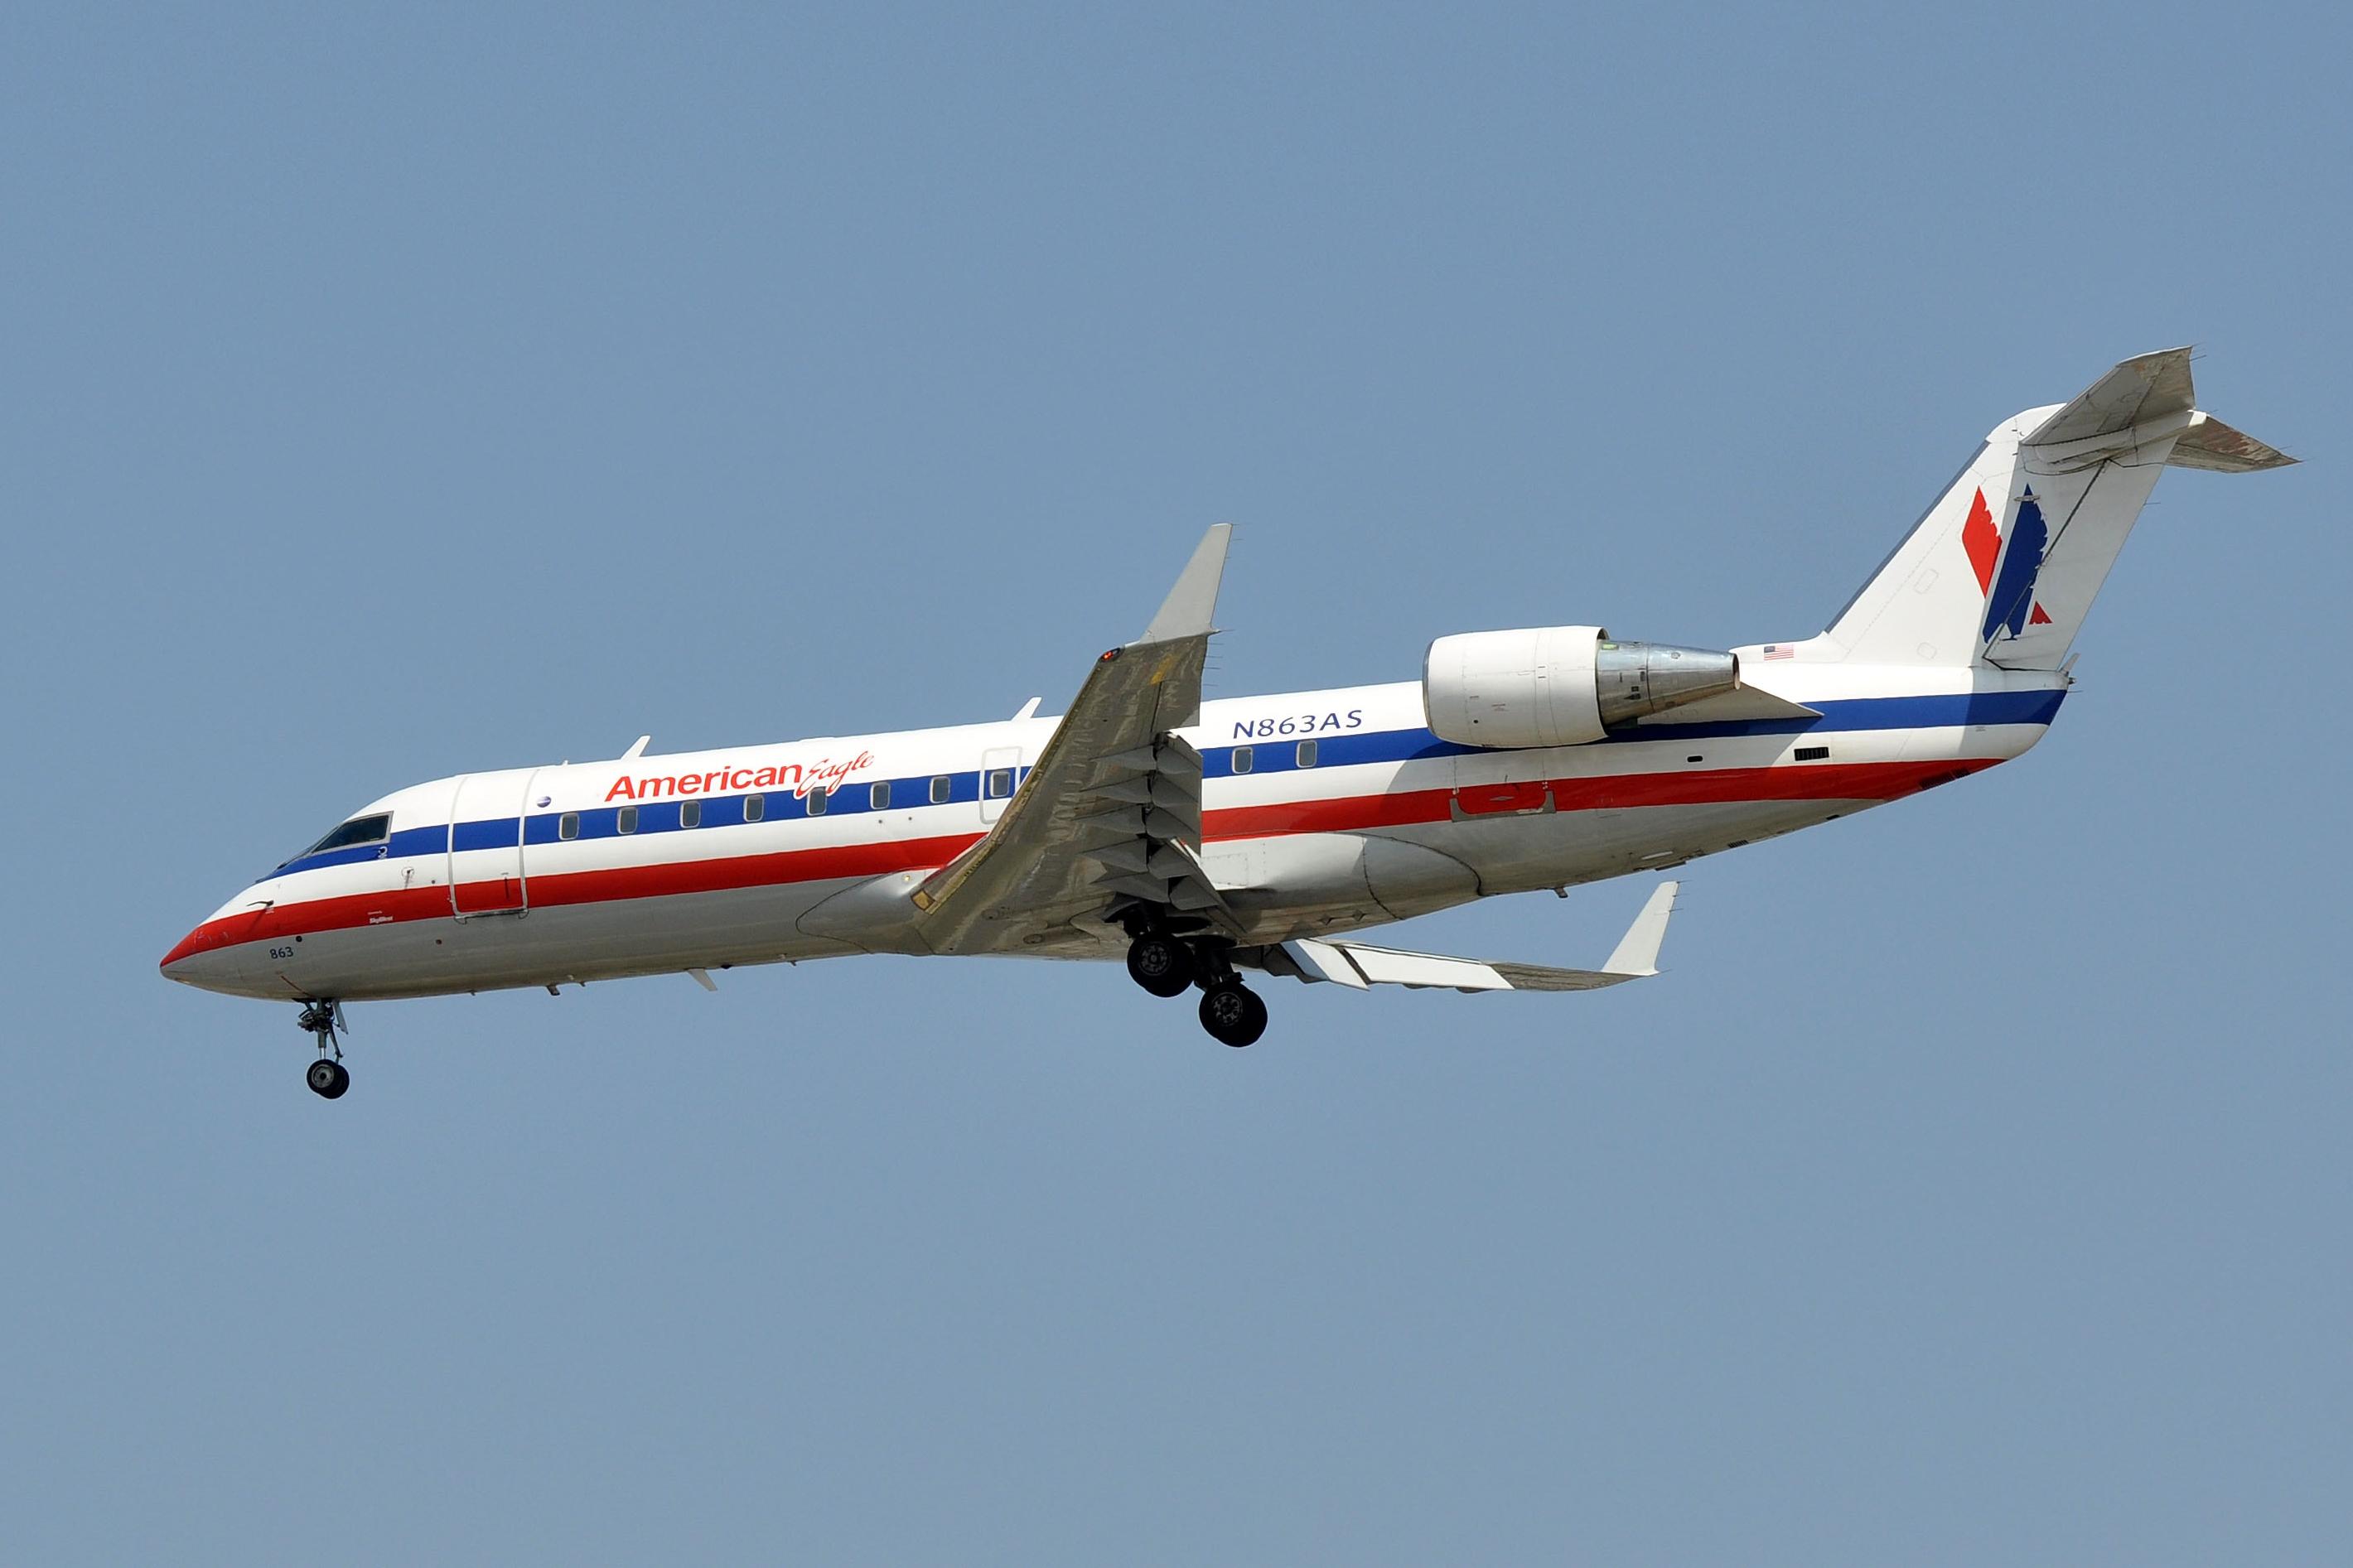 fileskywest airlines canadair crj200 n863as lax